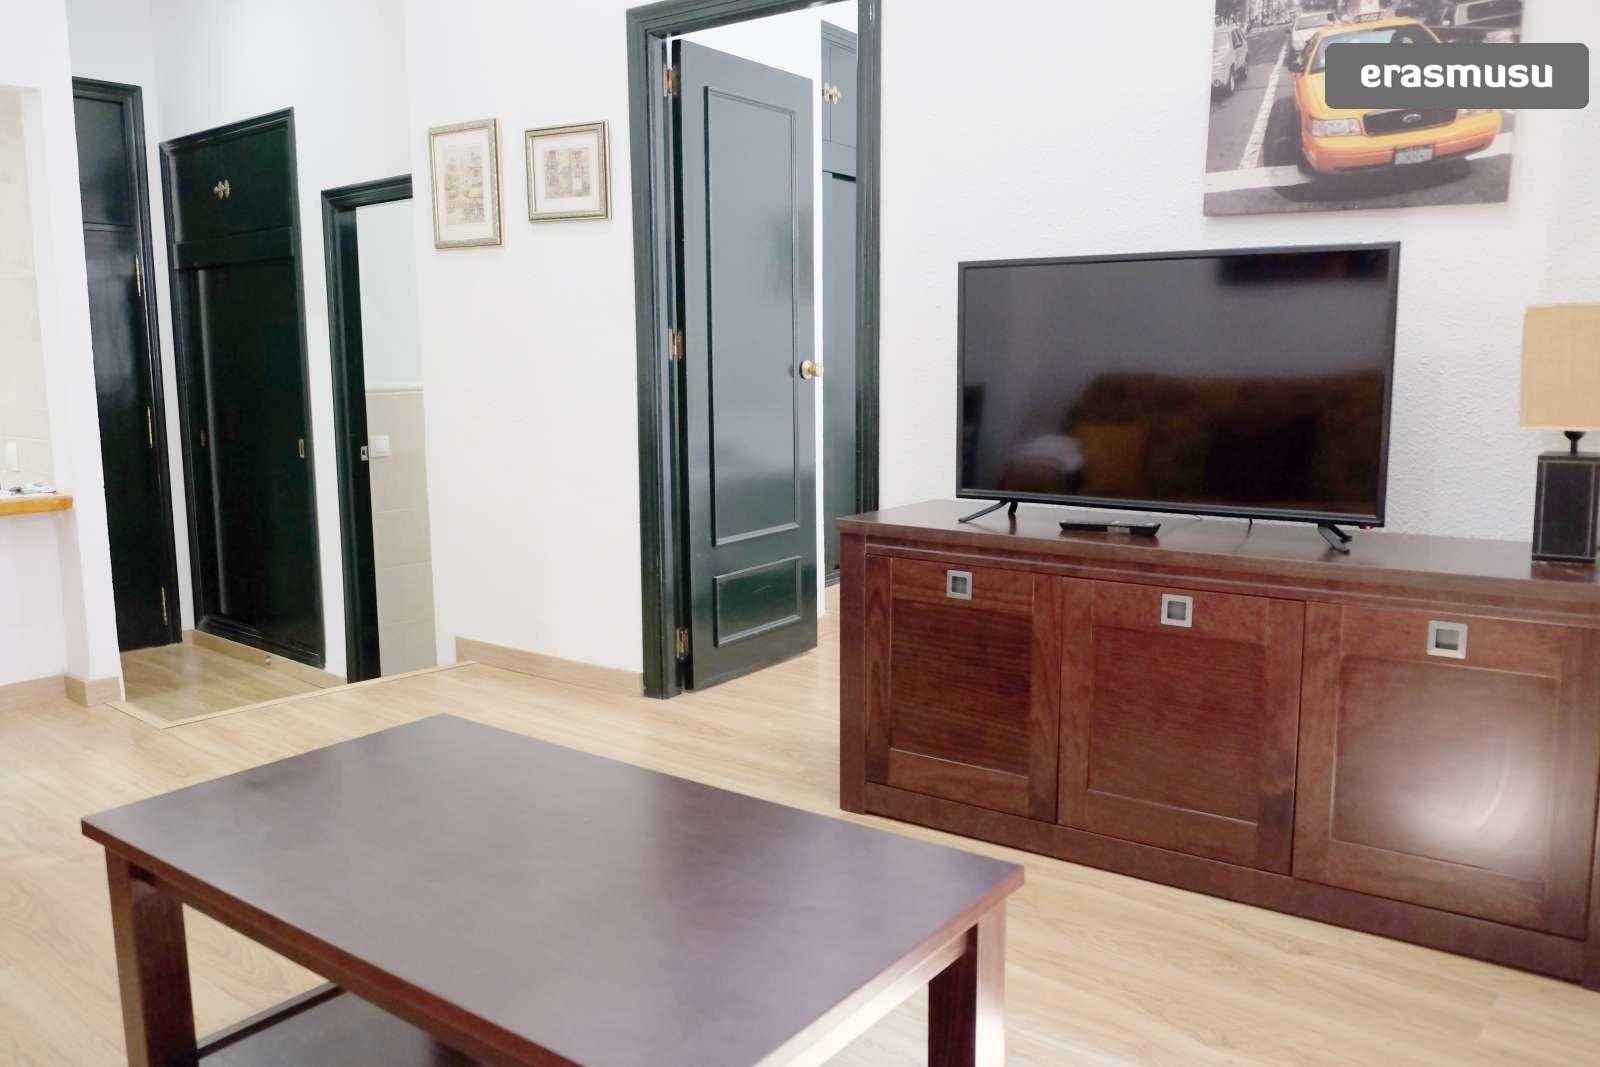 1 Bedroom Apartment For Rent In Center Alfalfa Flat Rent Sevilla